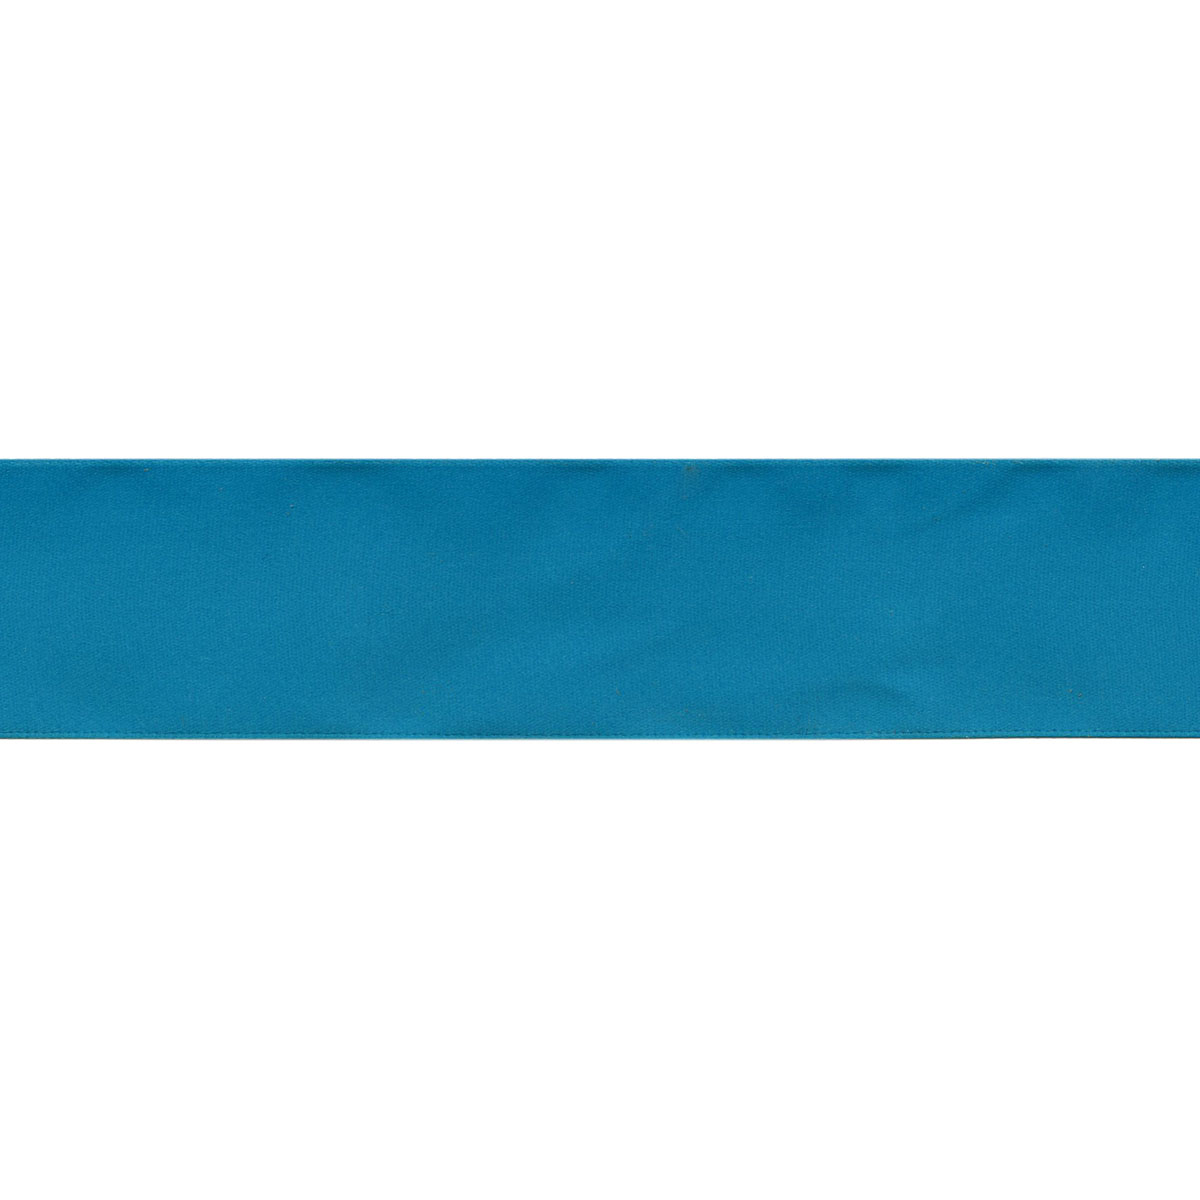 American Crafts Premium Ribbon 1 1/2 IN